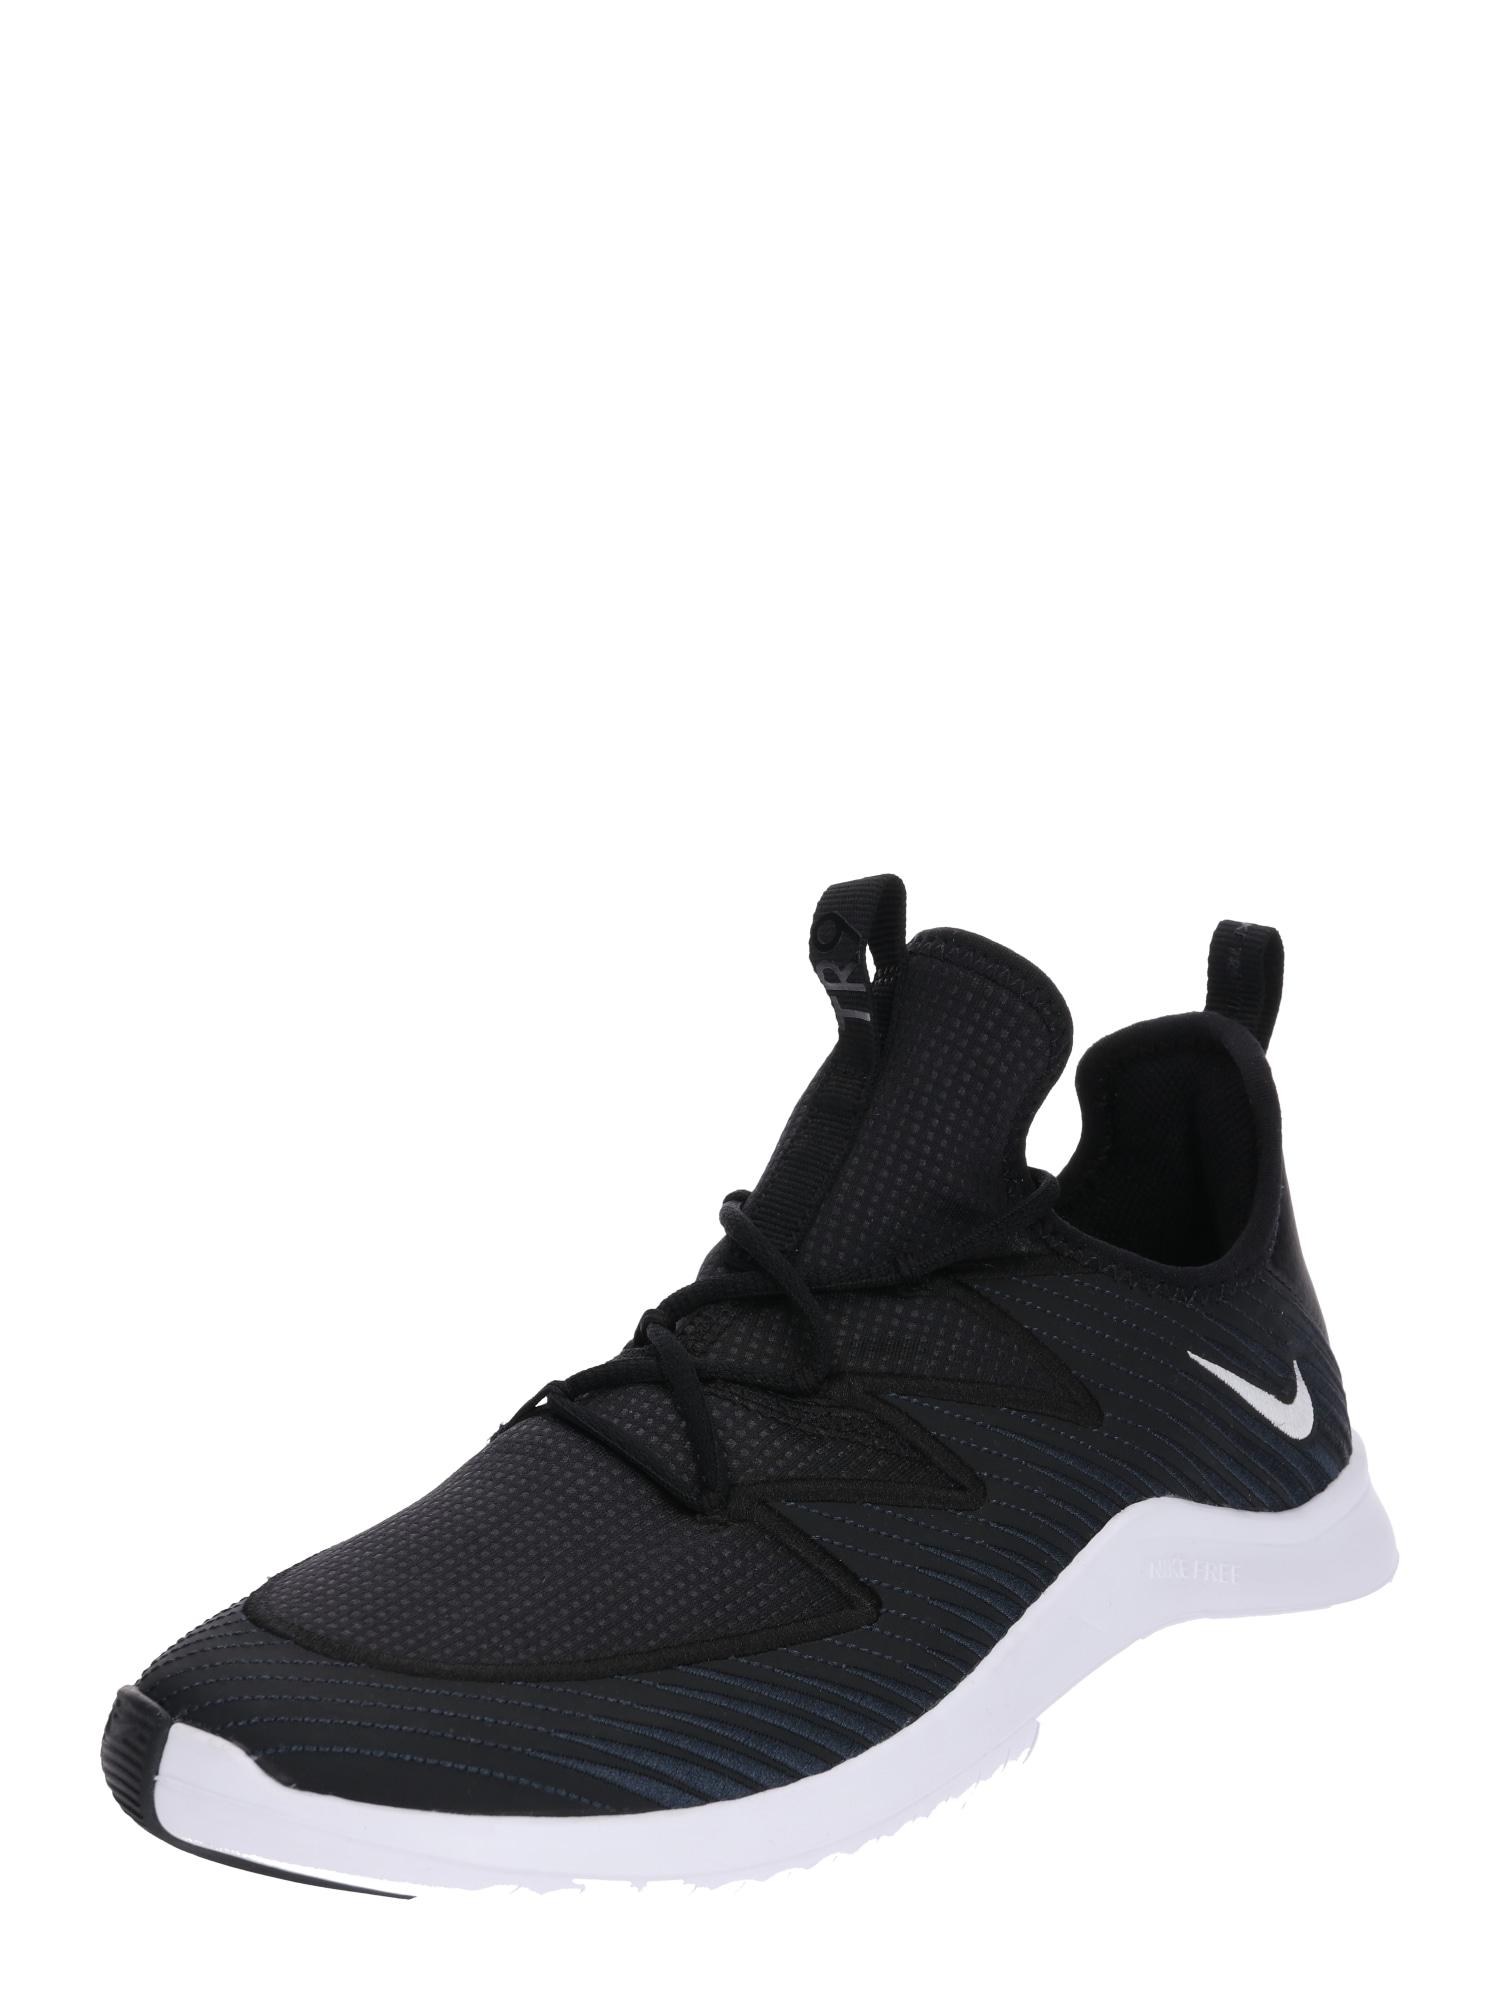 Sportovní boty Nike Free TR 9 černá bílá NIKE